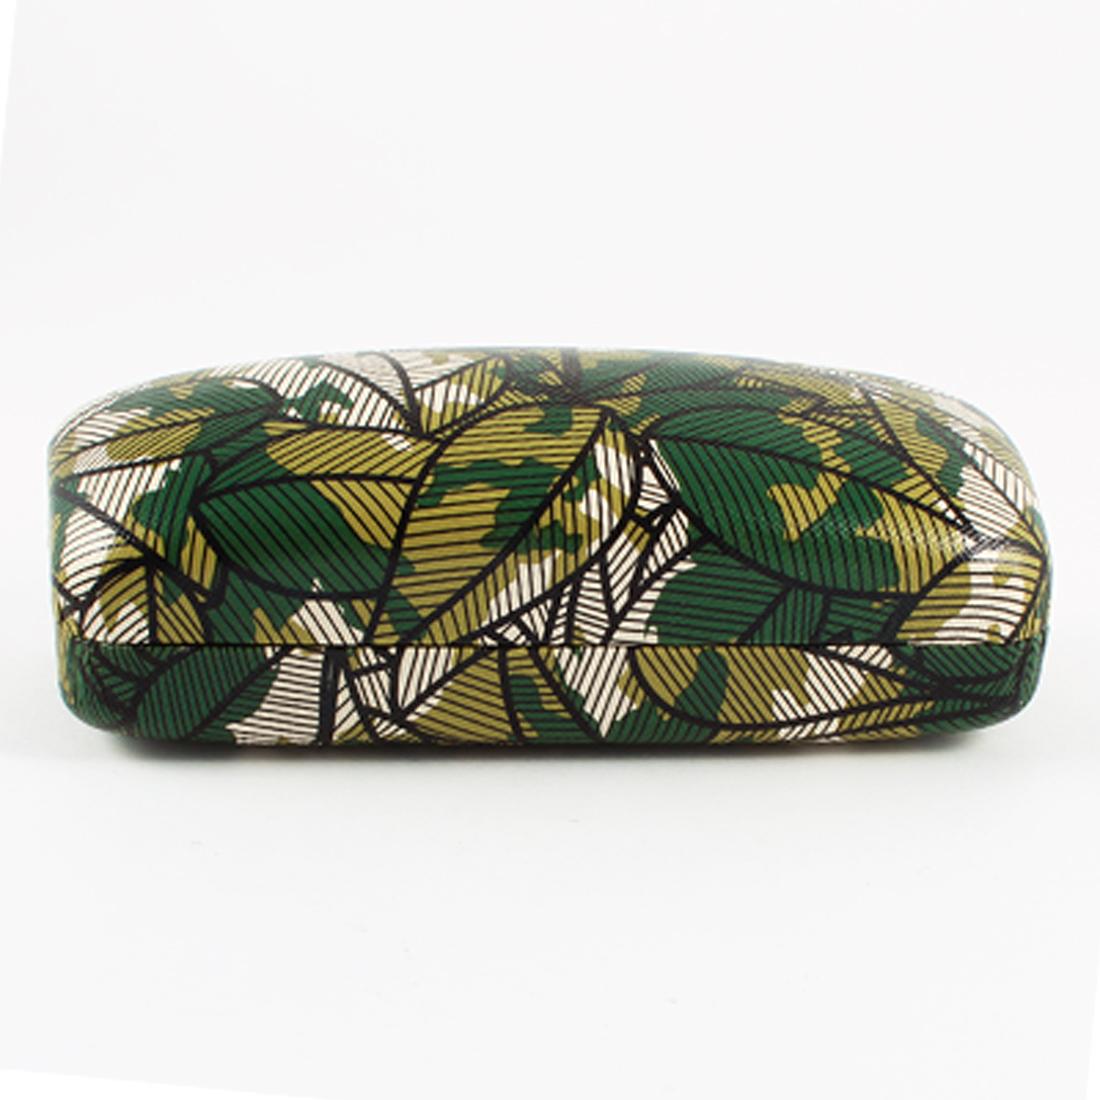 Black Stripe Pattern Metal Flannel Lining Box Case Olive Green for Eyeglasses